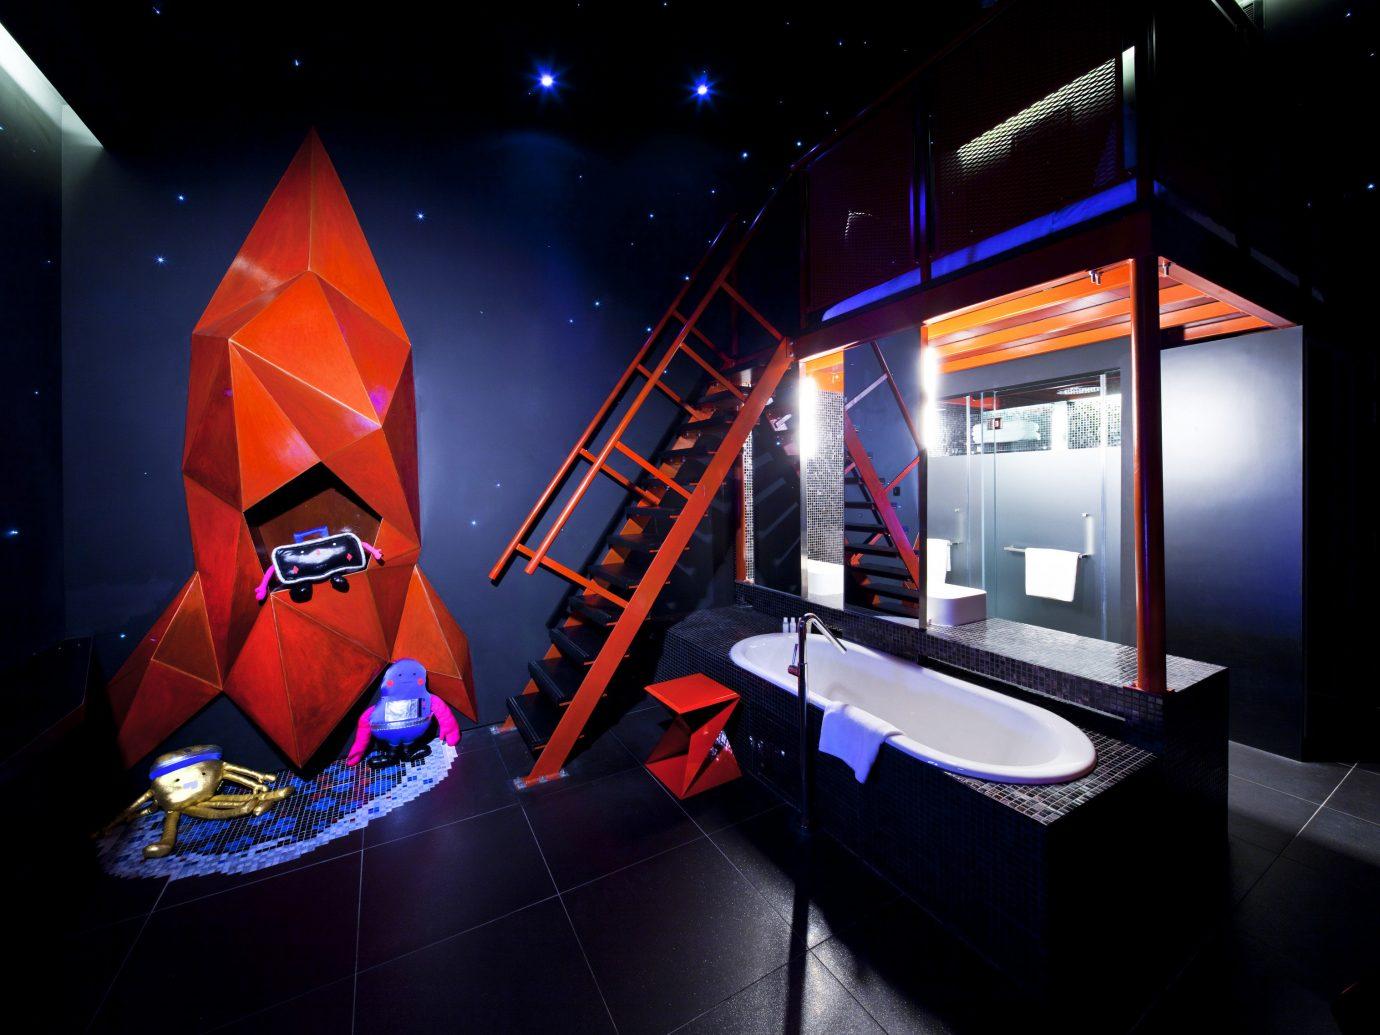 Budget indoor light night stage theatre screenshot Design vehicle space